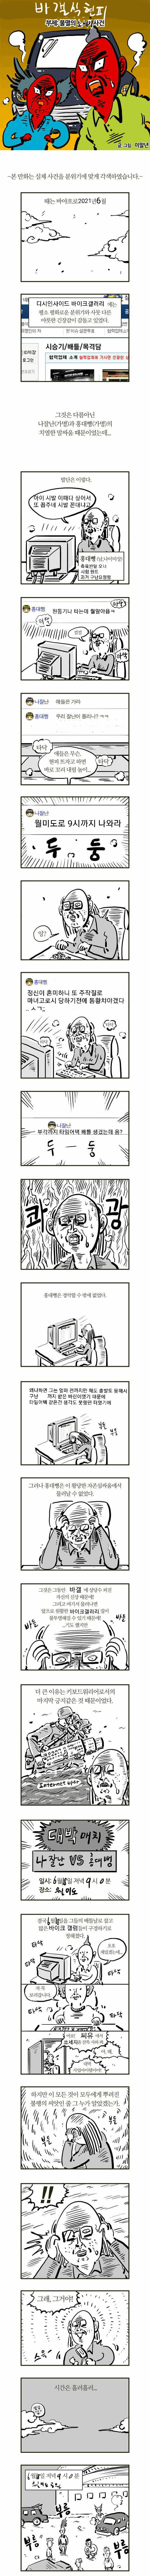 viewimage.php?id=2fb4db23&no=24b0d769e1d32ca73fec8ffa11d0283194eeae3ea3f7d0da351cf9d3408d70137b4ca4083b252e96bc69dd822a0a2b97677f6b9b039baded31f28543825107b79285450d914ebeca249879942f132fd30cab348107e8cae0b8bd54942cb20500cc0ad7ce3e